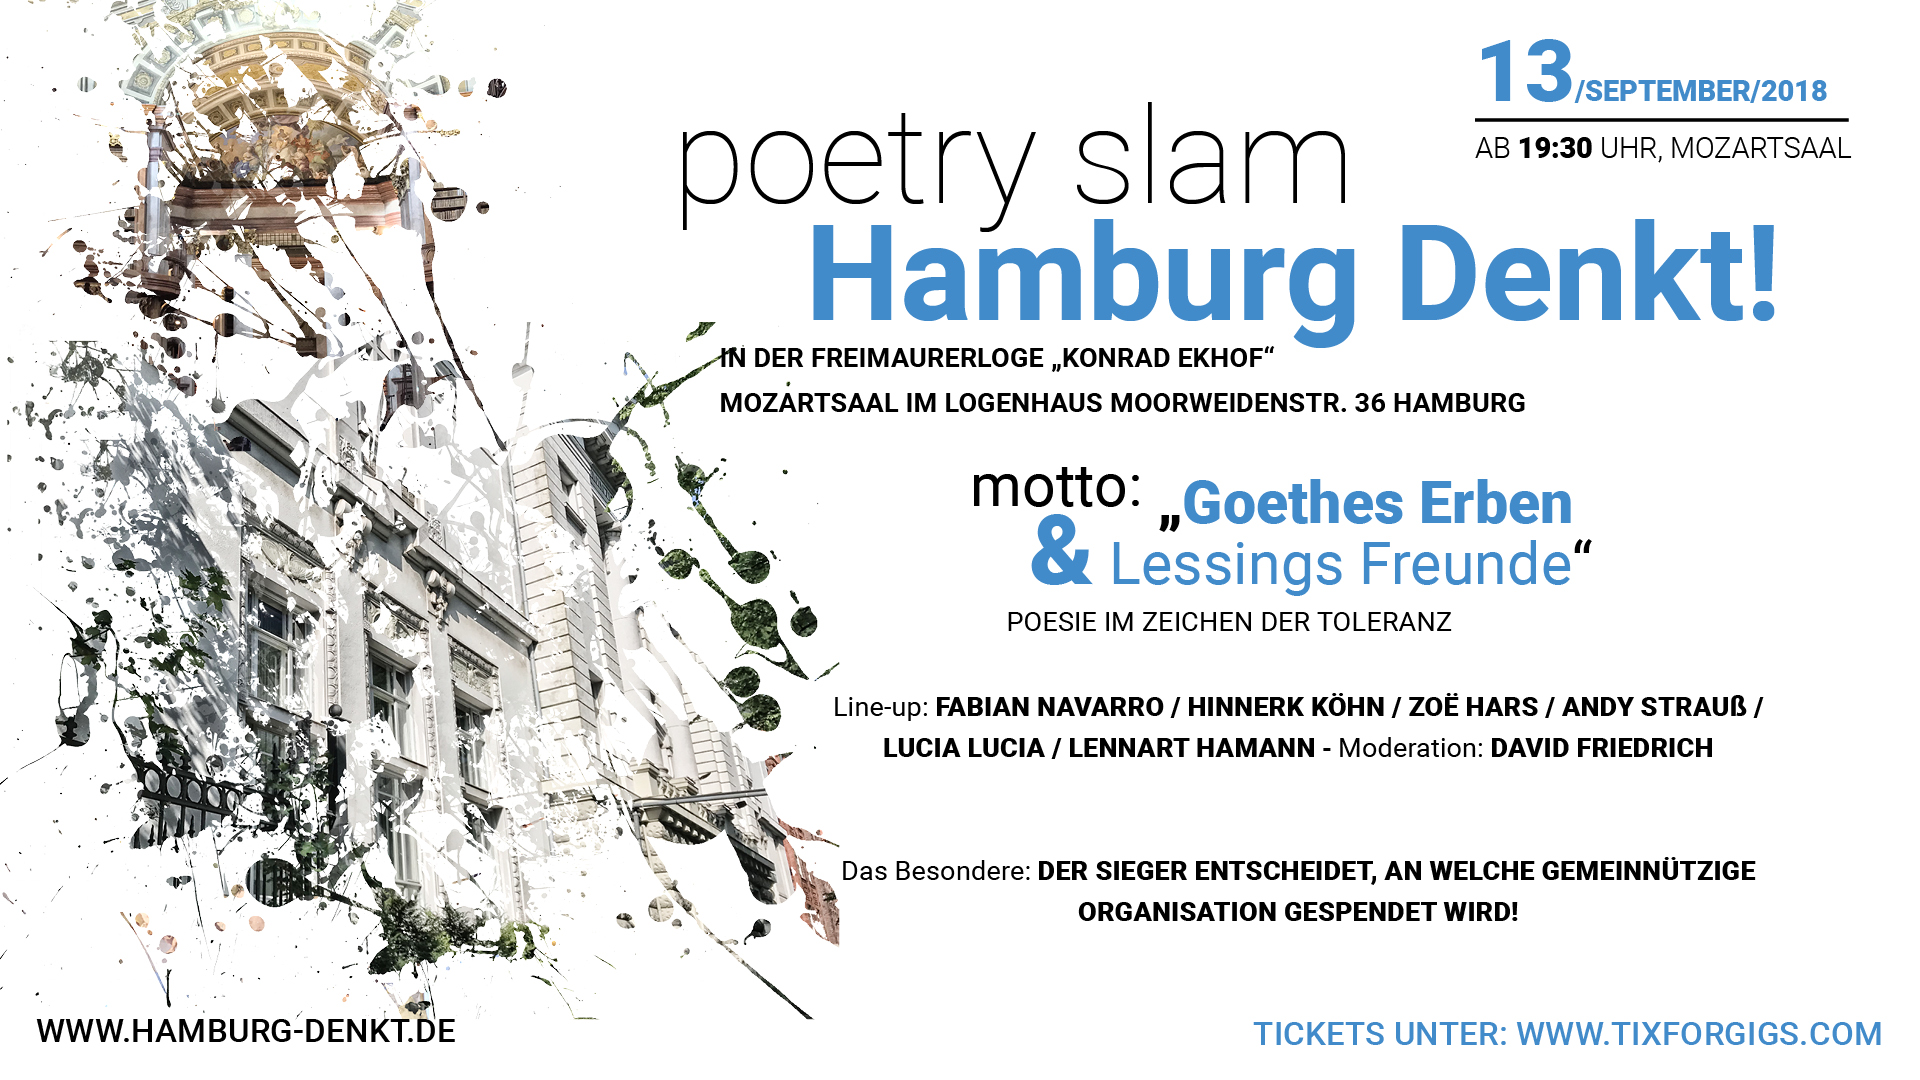 Preview: poetry slam - Hamburg denkt